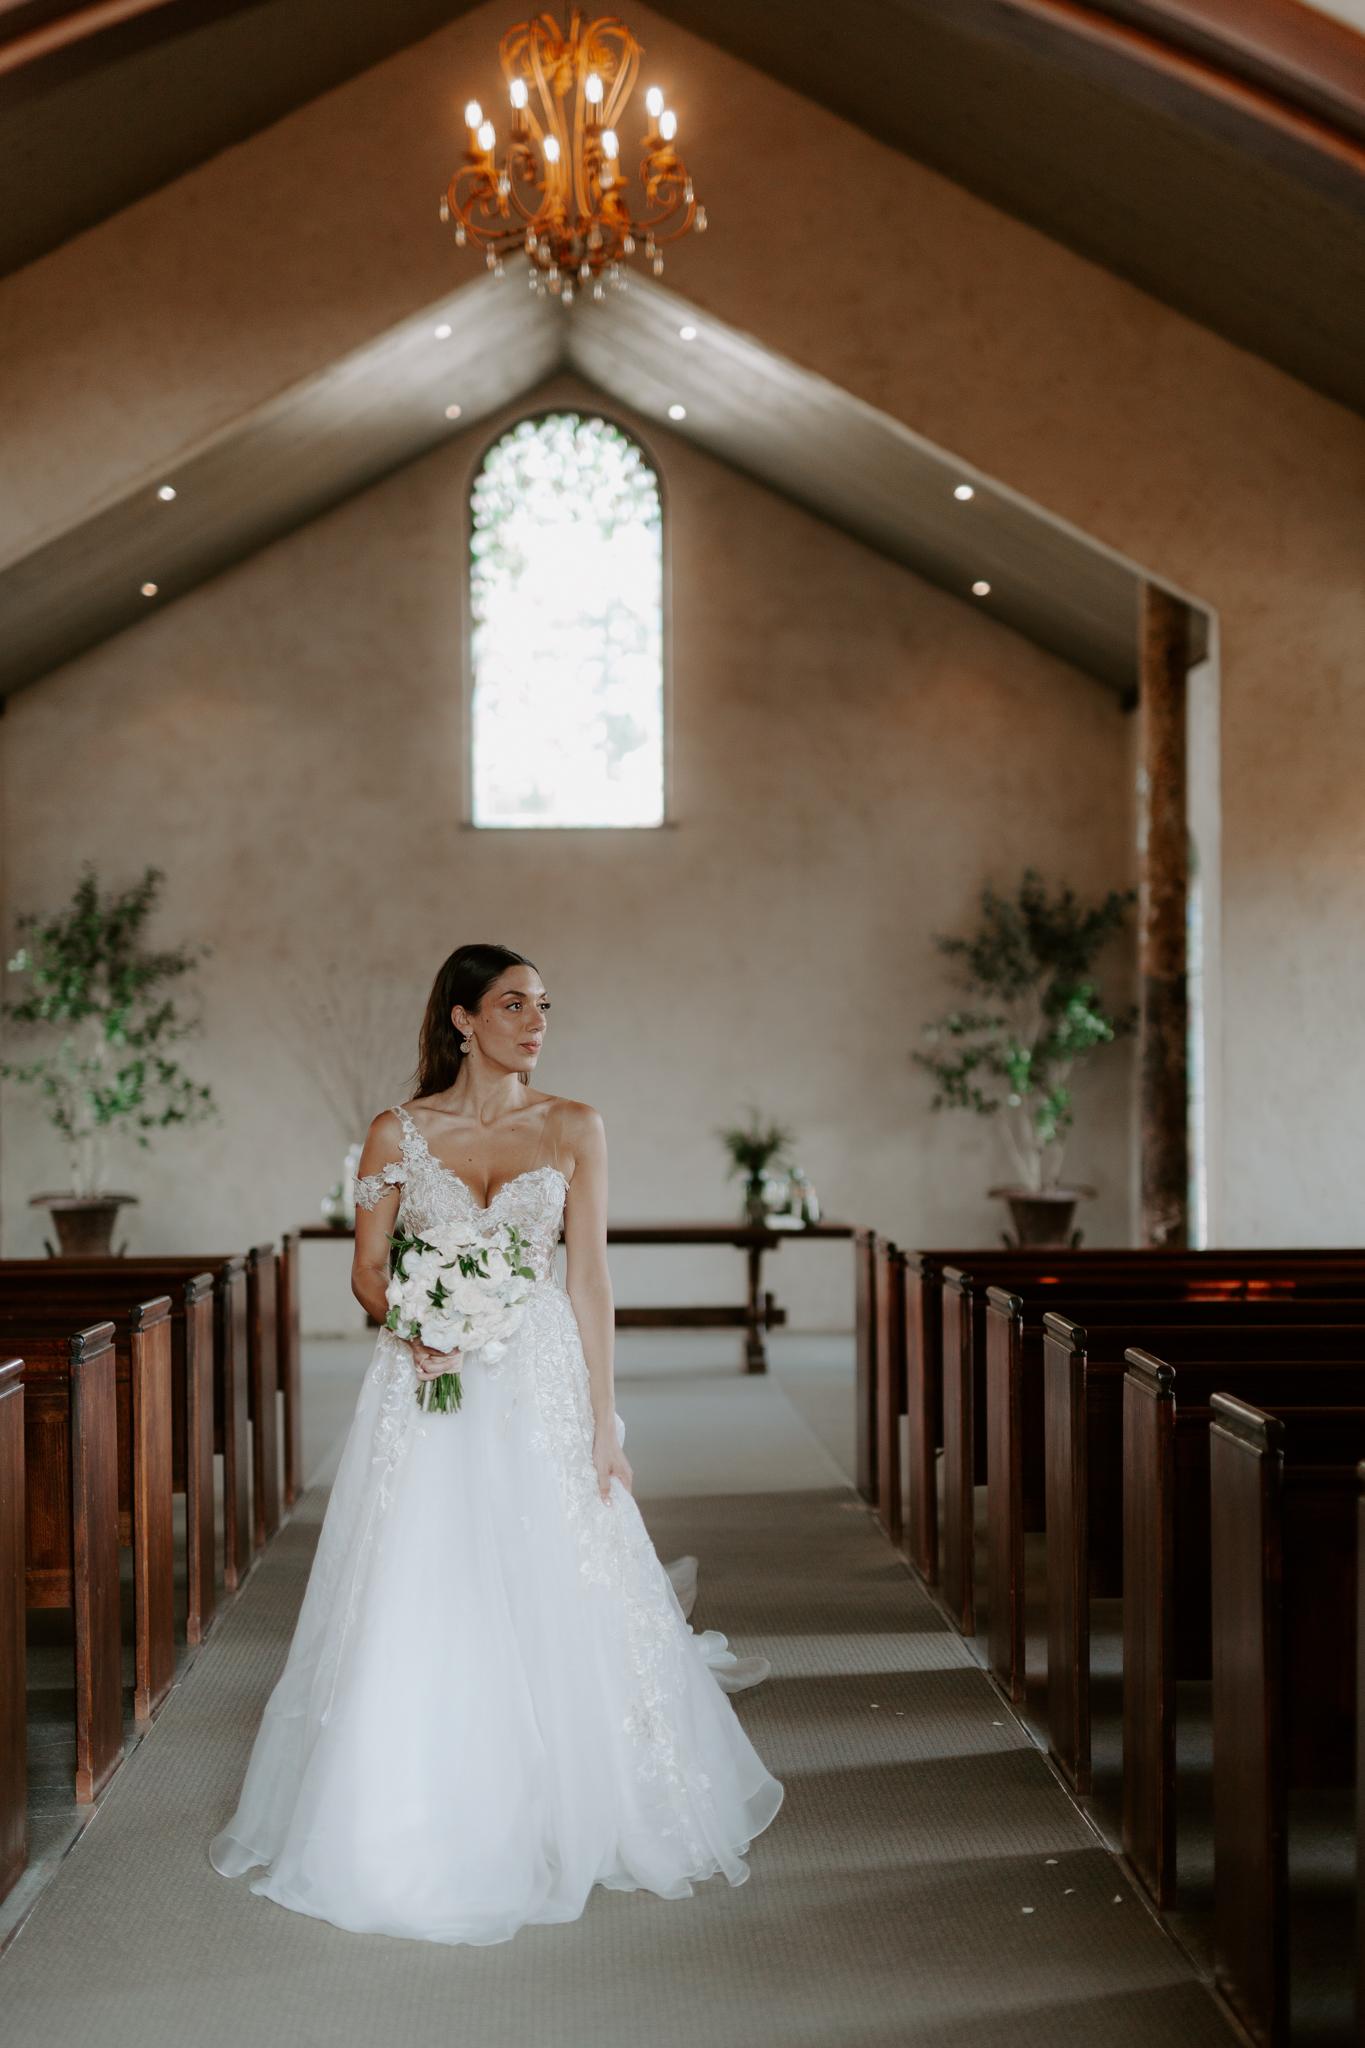 The-Stones-of-Yarra-Valley-Wedding-EmotionsandMathPhotography-149.jpg